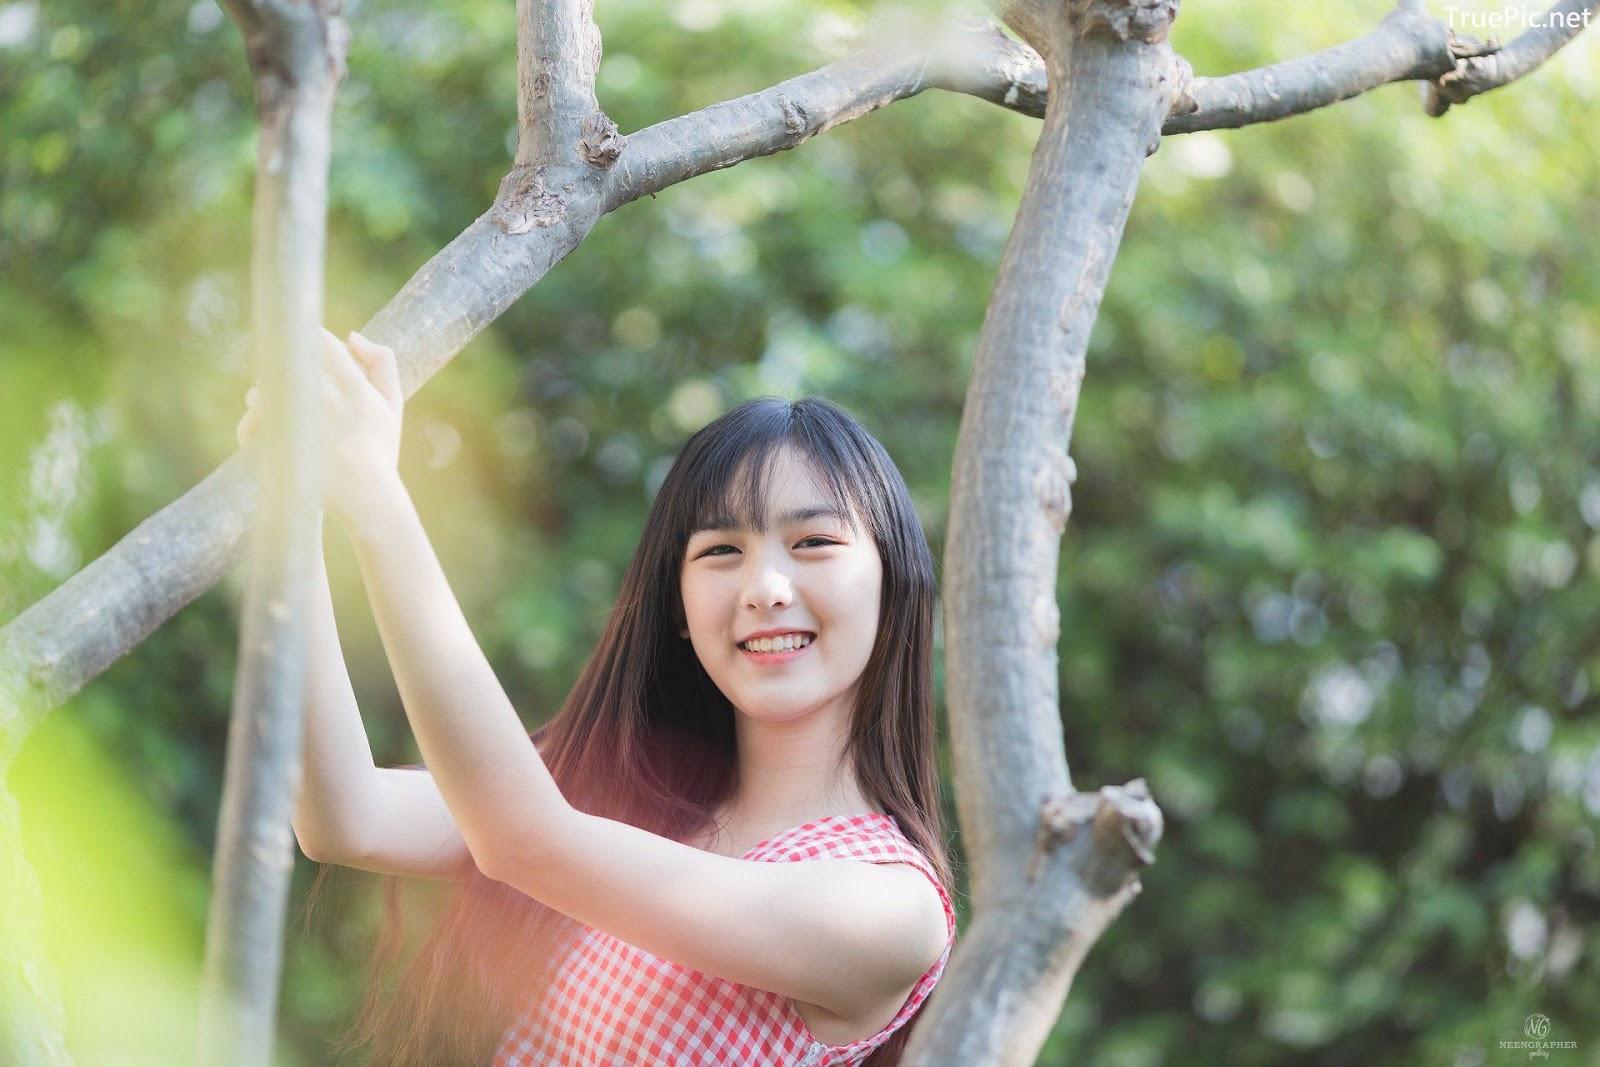 Image-Thailand-Cute-Model-Emma-Panisara–Album-Emma-Bright-Sunday-TruePic.net- Picture-14